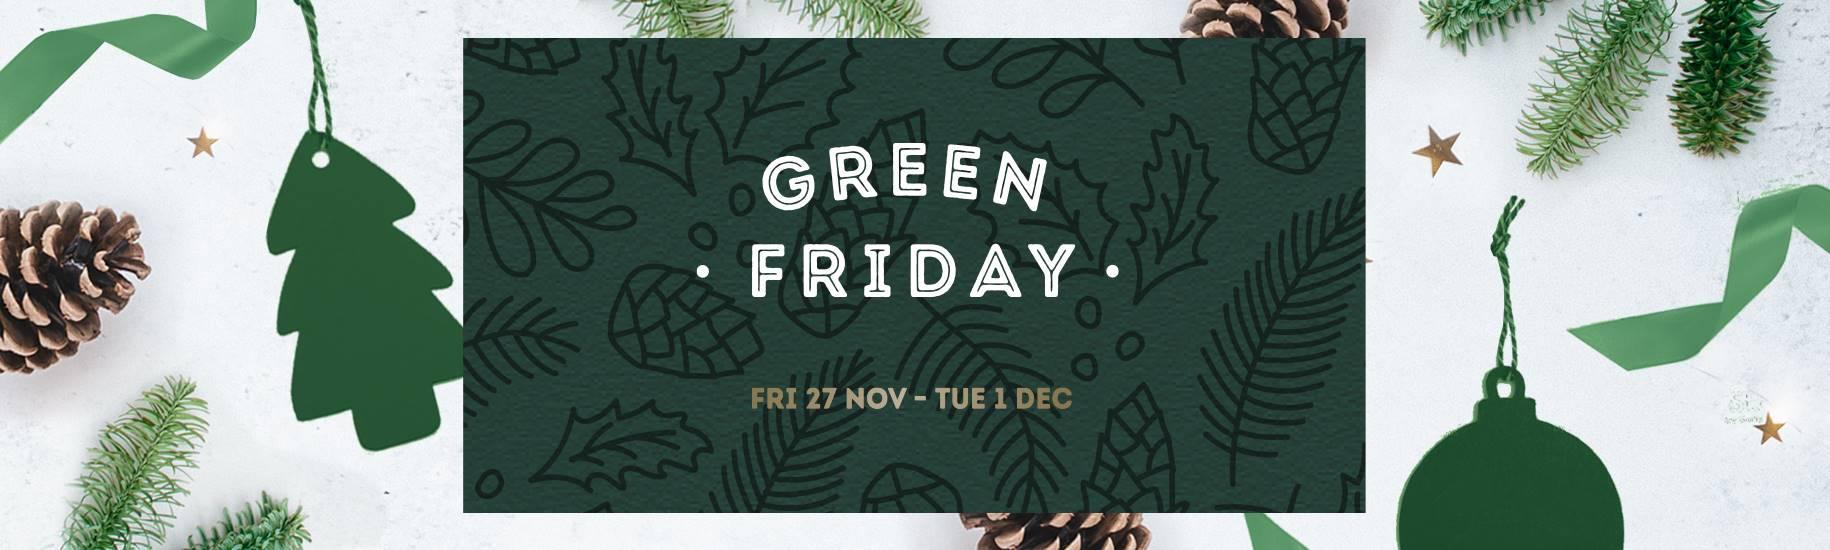 Nourish Green Friday Black Friday